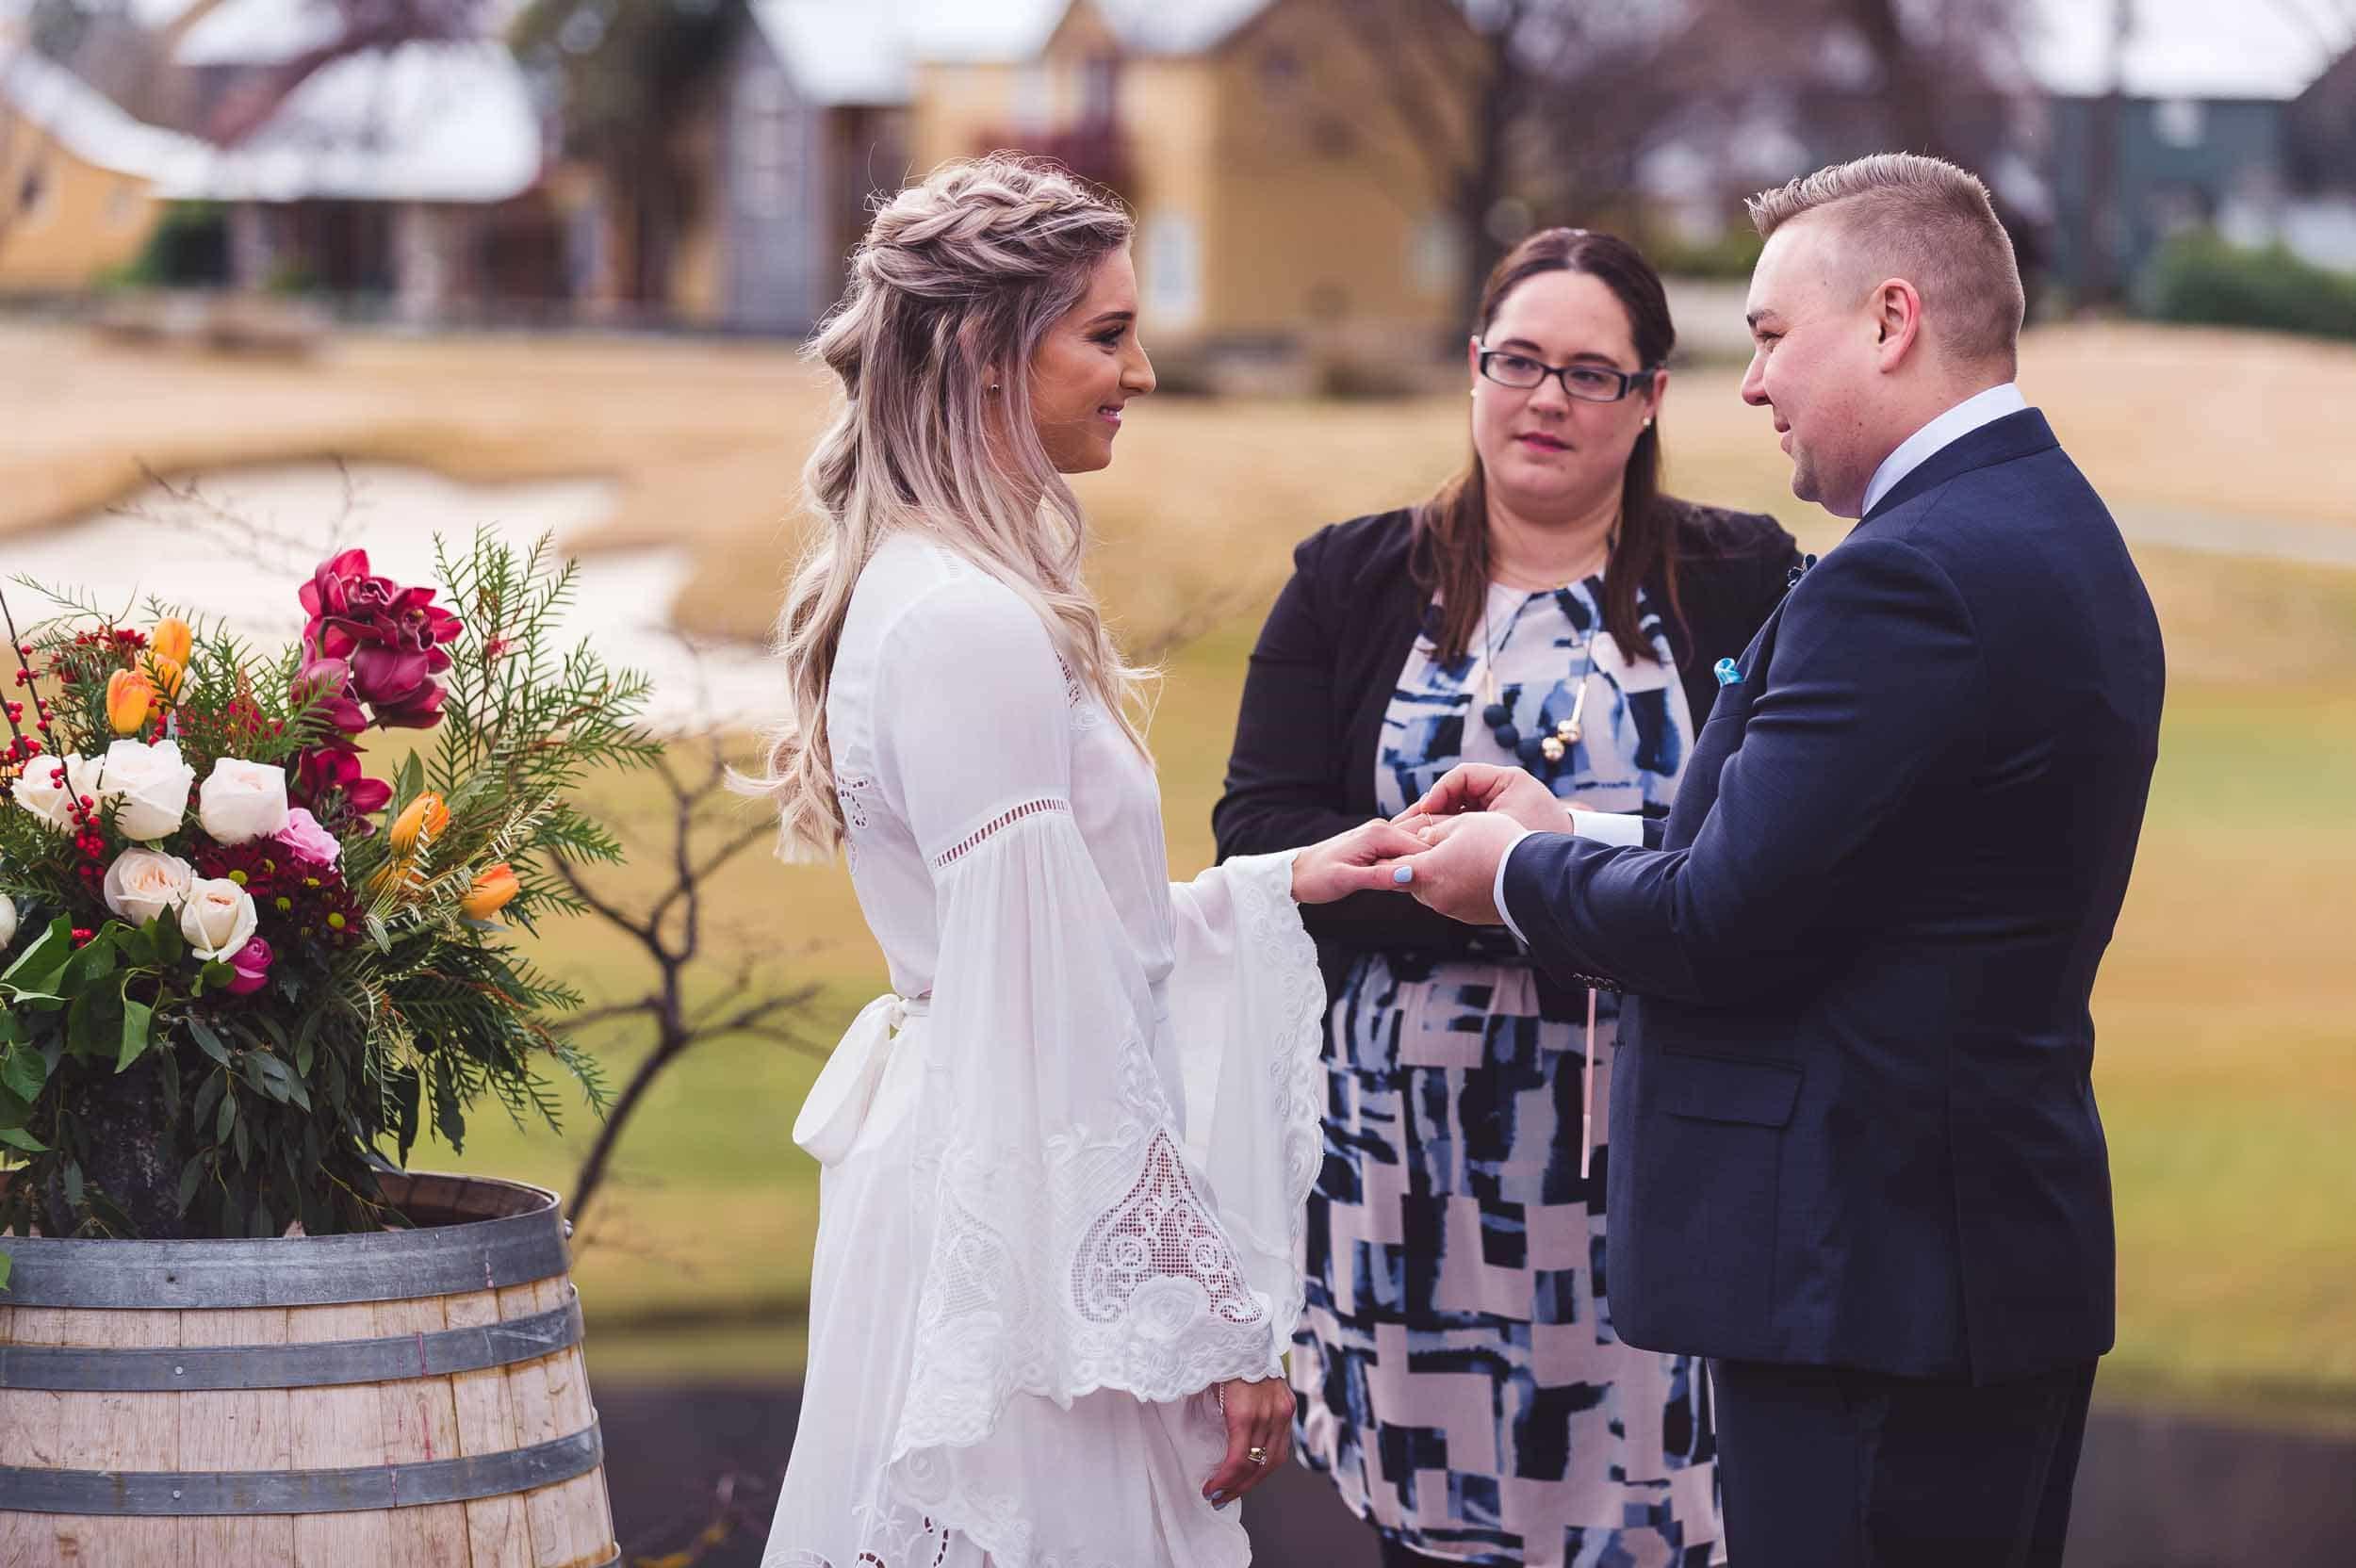 blog post featured image Laura + Nick | Winter Wedding at Milbrook Resort fallon photography